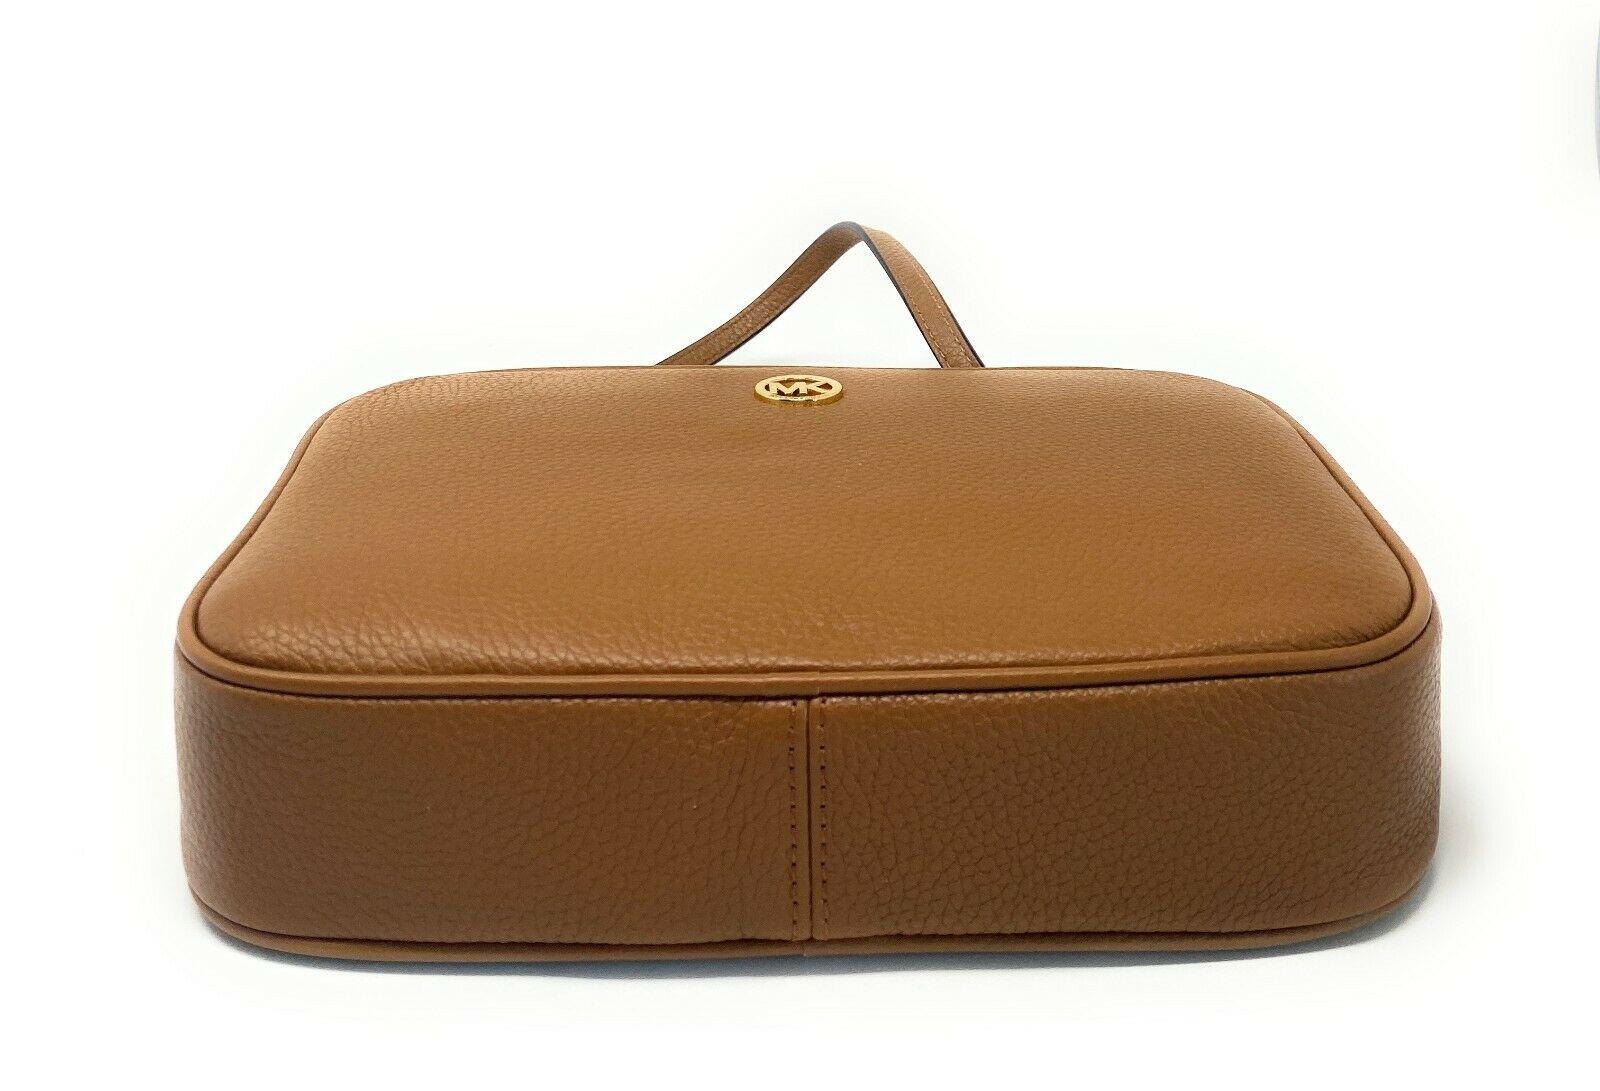 thumbnail 66 - Michael Kors Jet Set Item Large East West Crossbody Chain Handbag Clutch $298